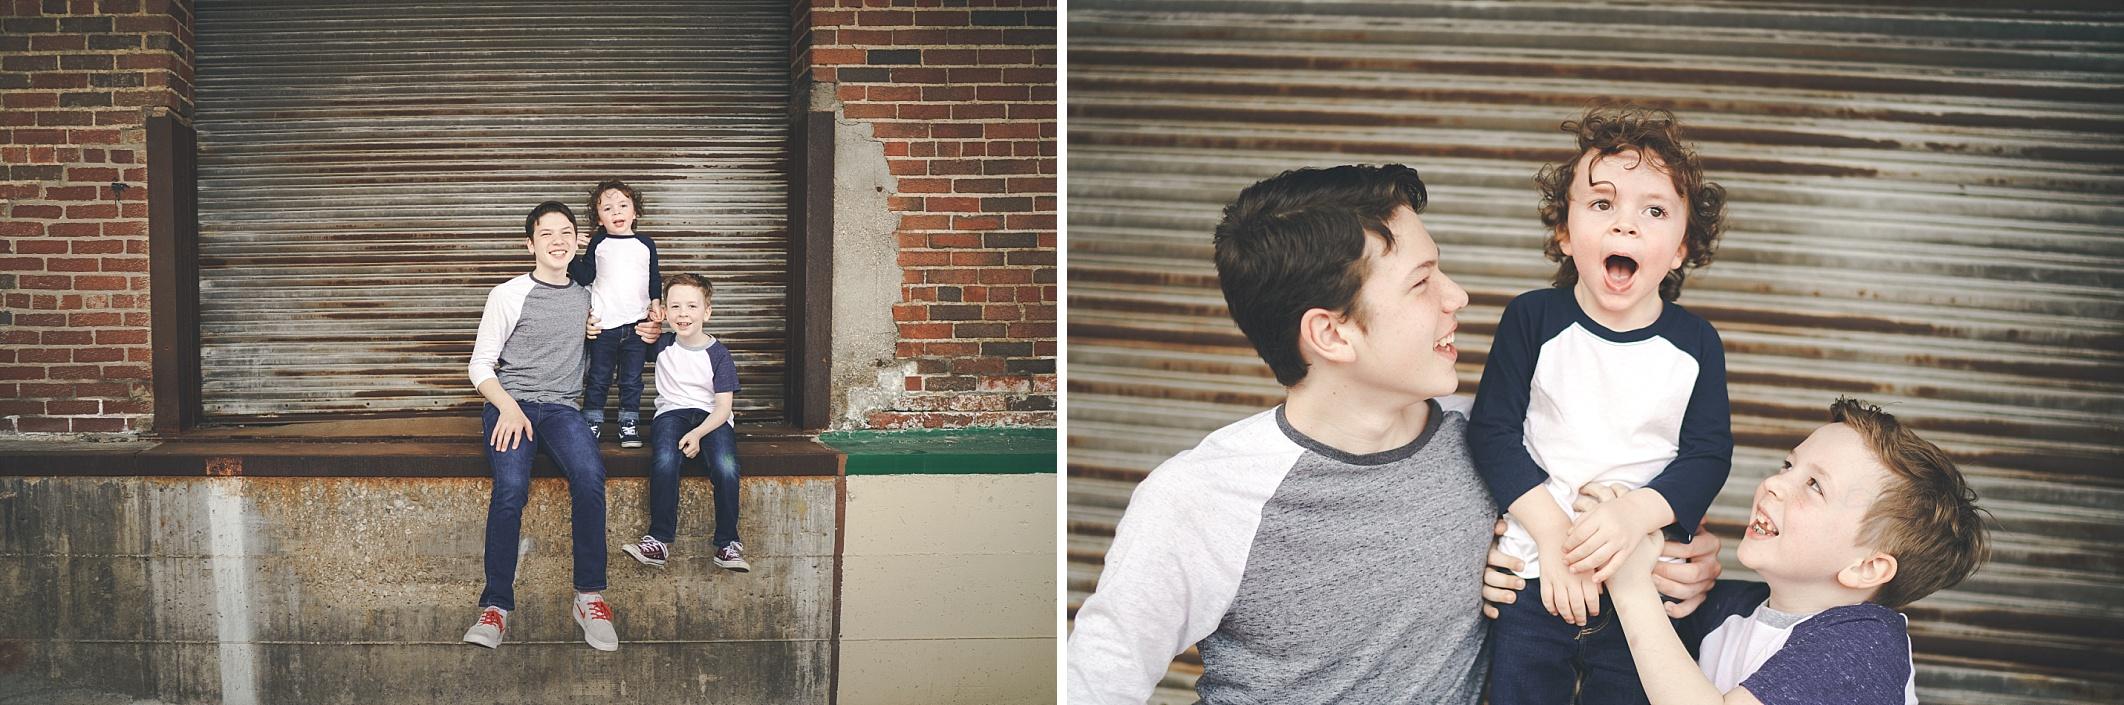 0024_young-family-children-photography-dayton.jpg